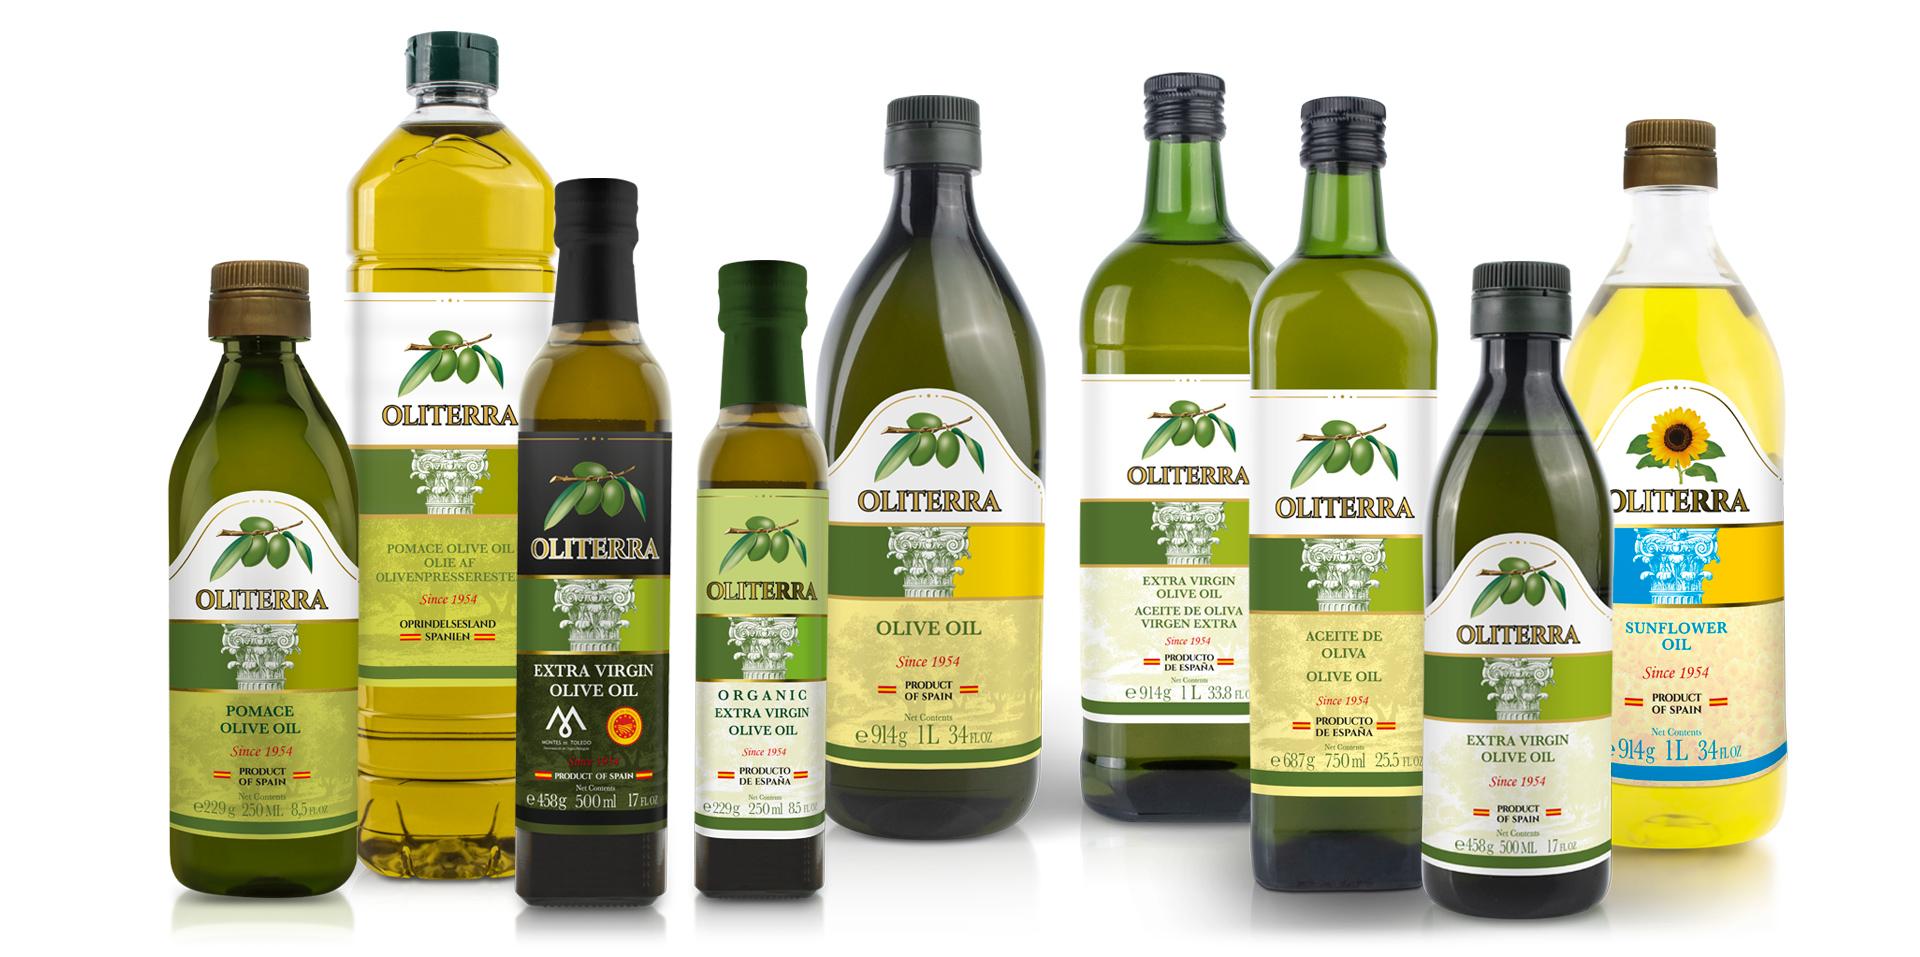 Oliterra, marca líder de Aceites Toledo. Packaging aceite.